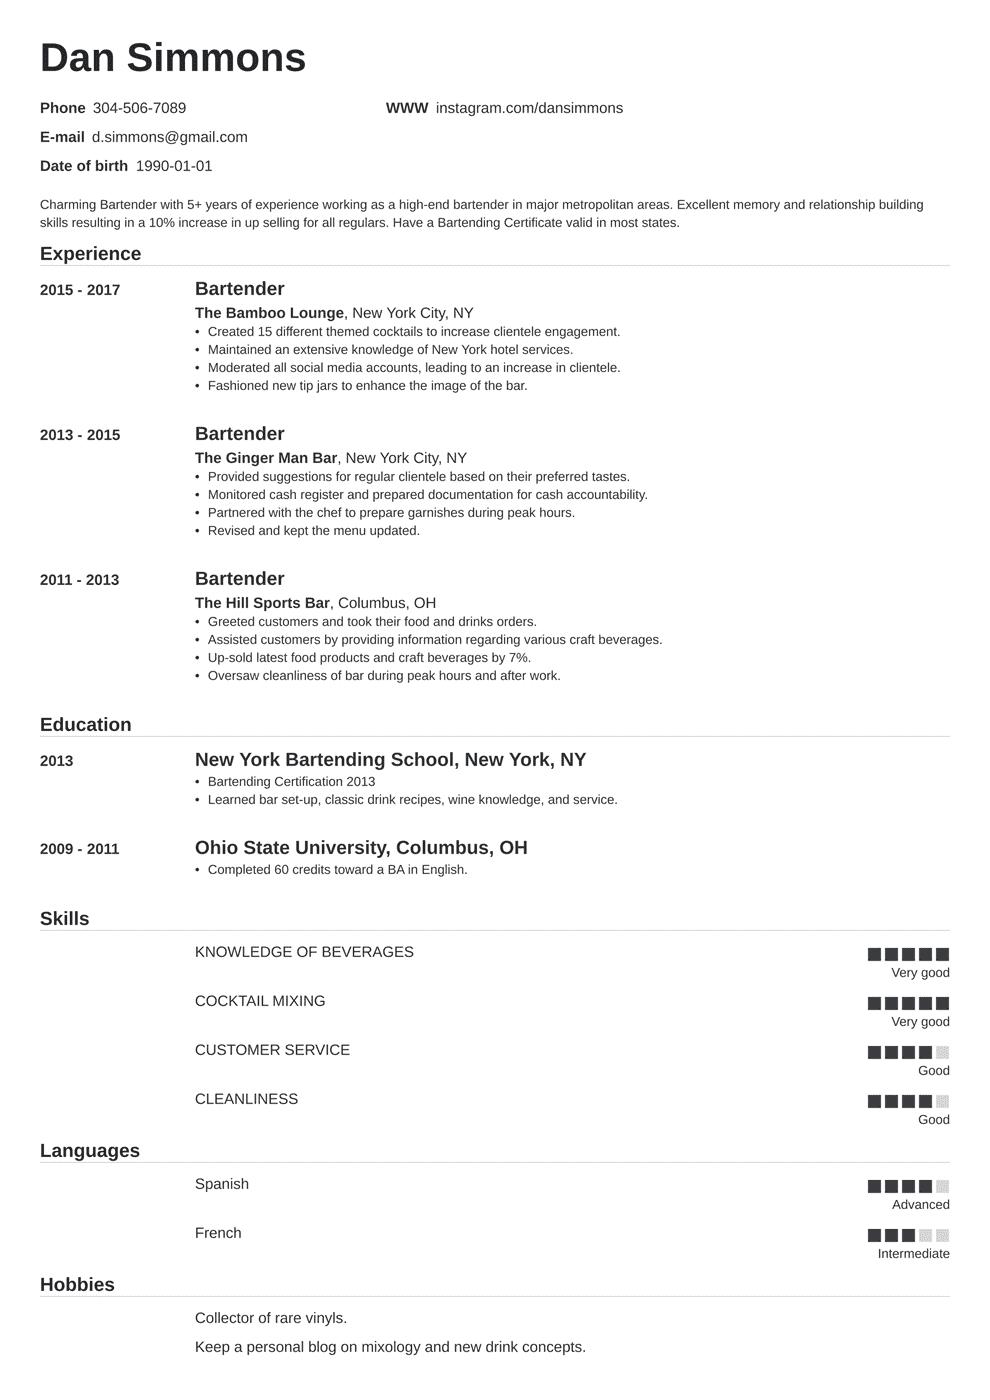 Bartender Resume Templates Free Resume Examples bartender resume templates free bartender resume template bartender resume template microsoft word bartender resume template download bartender resume description sample bartender cv template free bartender resume sample no experience